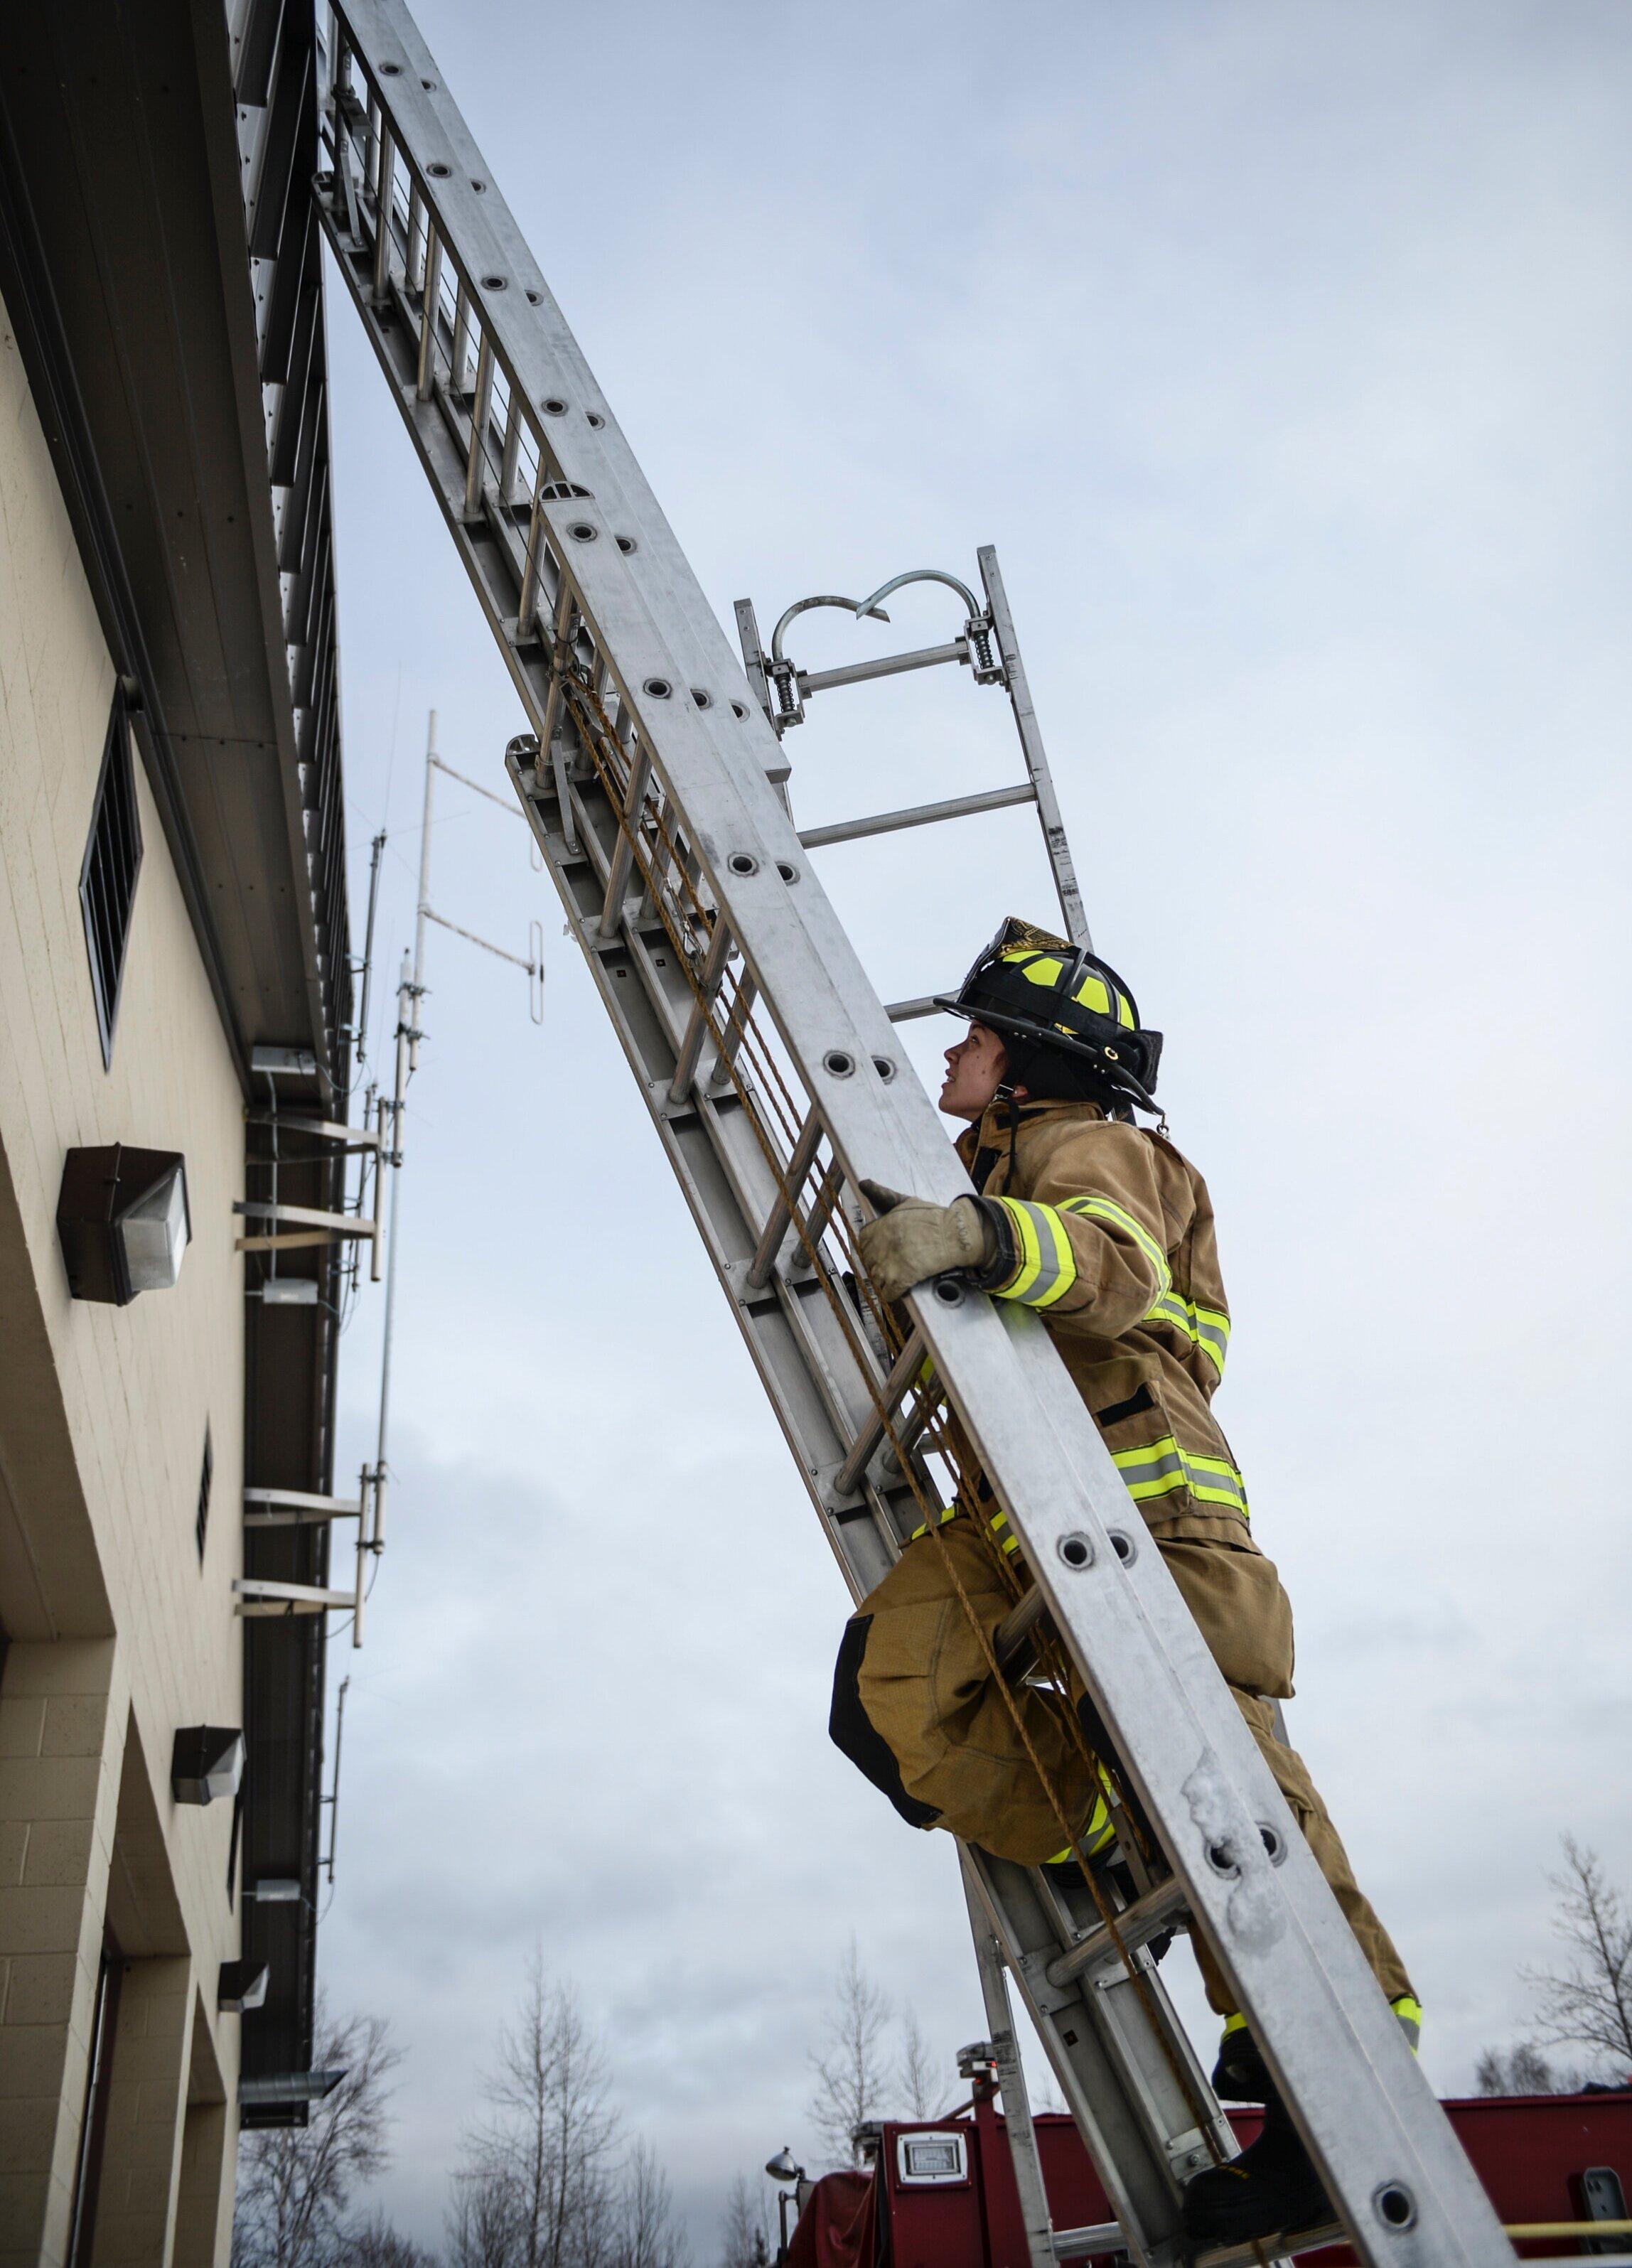 firefighter ground ladder training